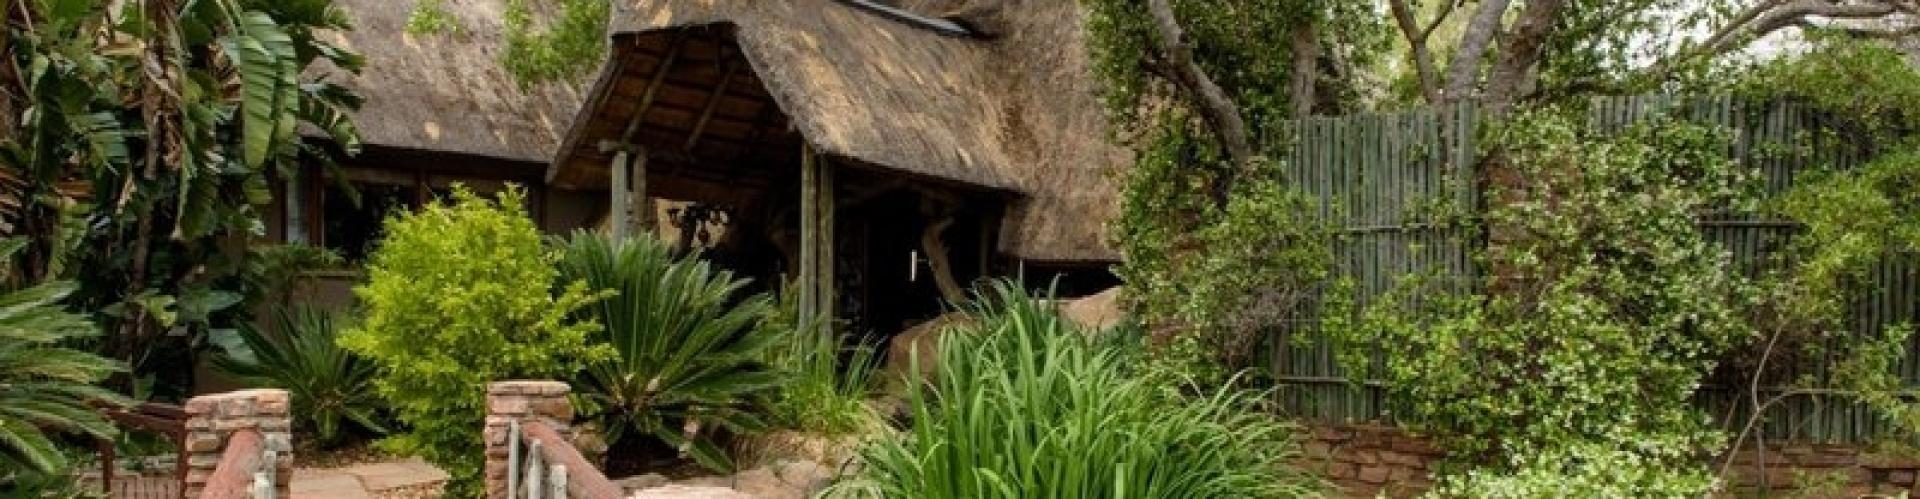 limpopo zuid afrika vacationhouse